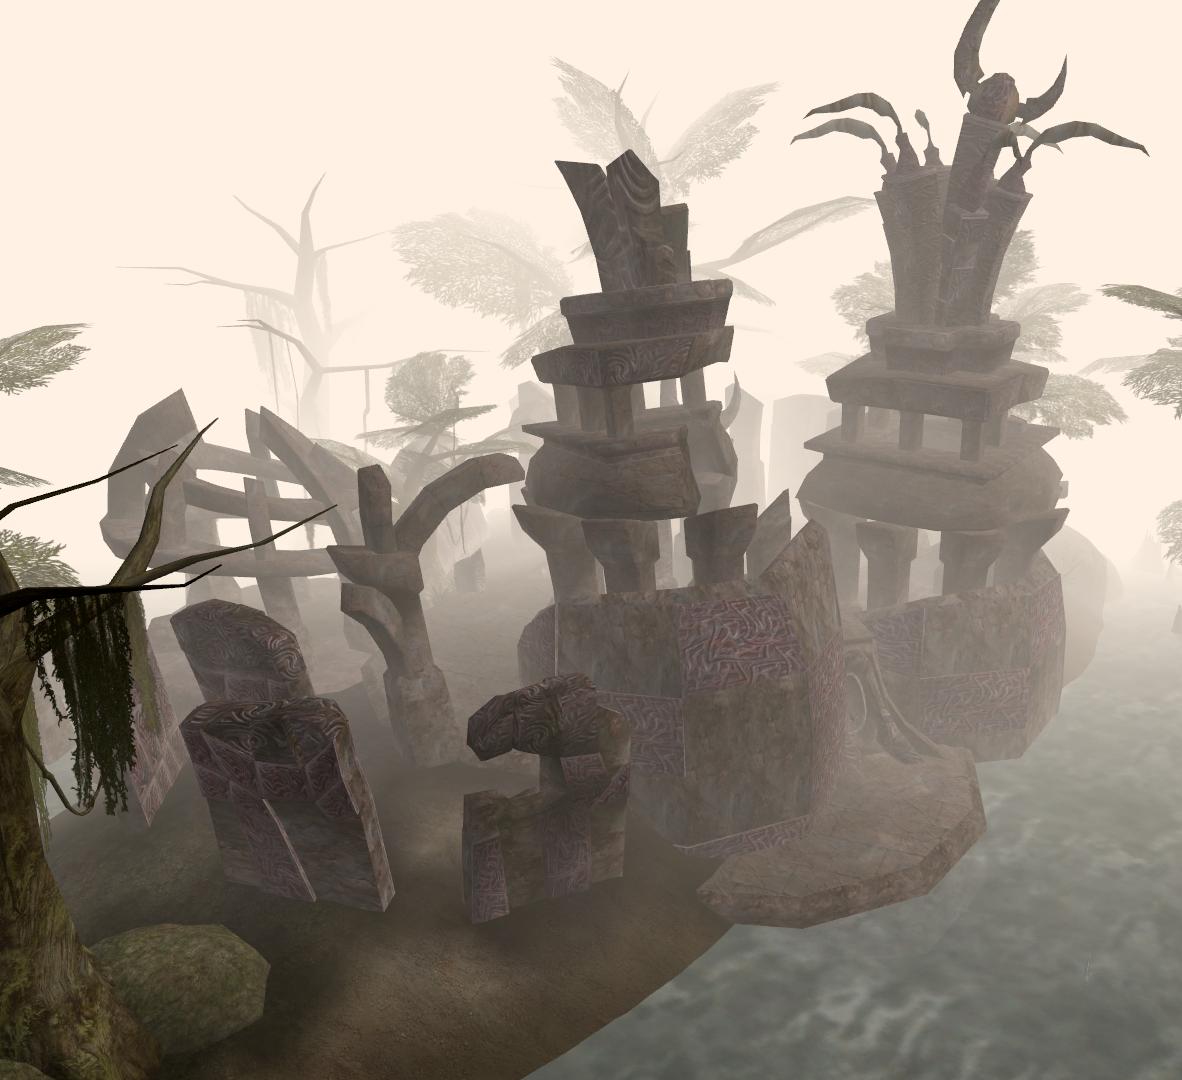 Addadshashanammu (Morrowind)